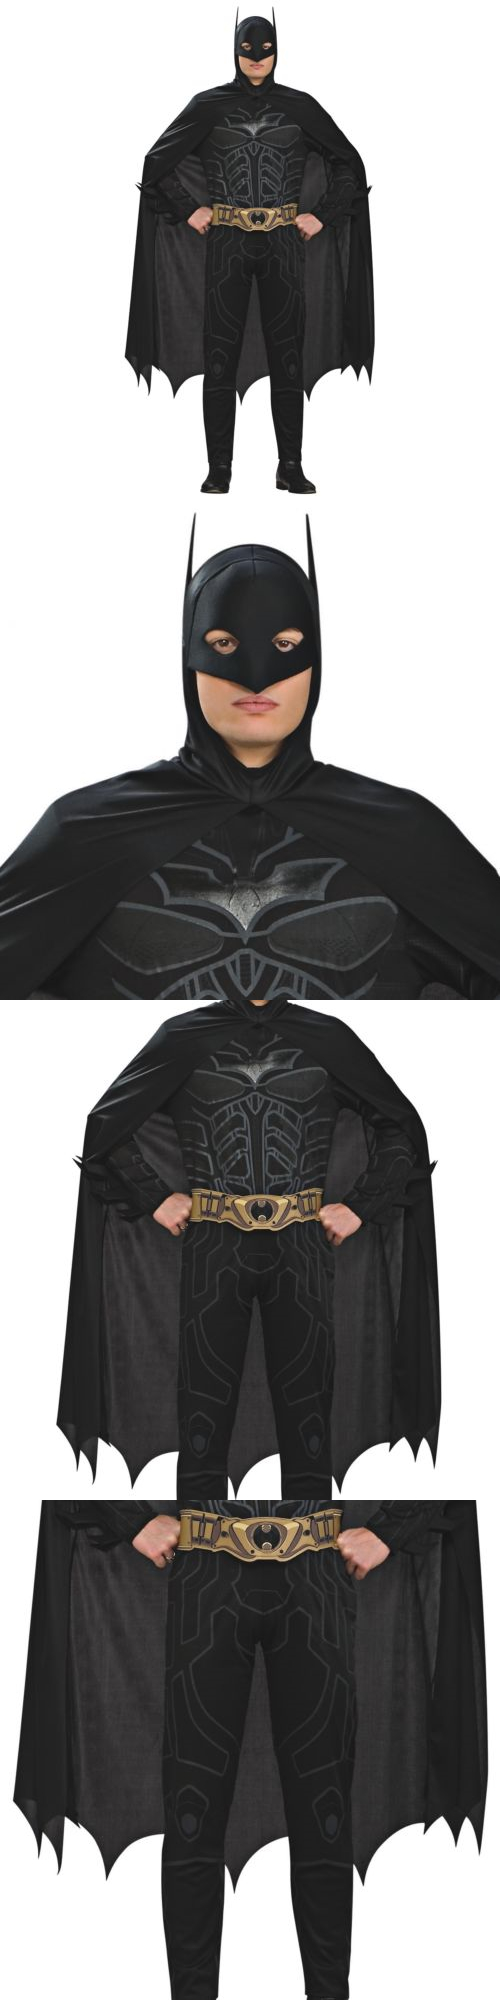 men costumes batman costume adult the dark knight superhero halloween fancy dress u003e buy